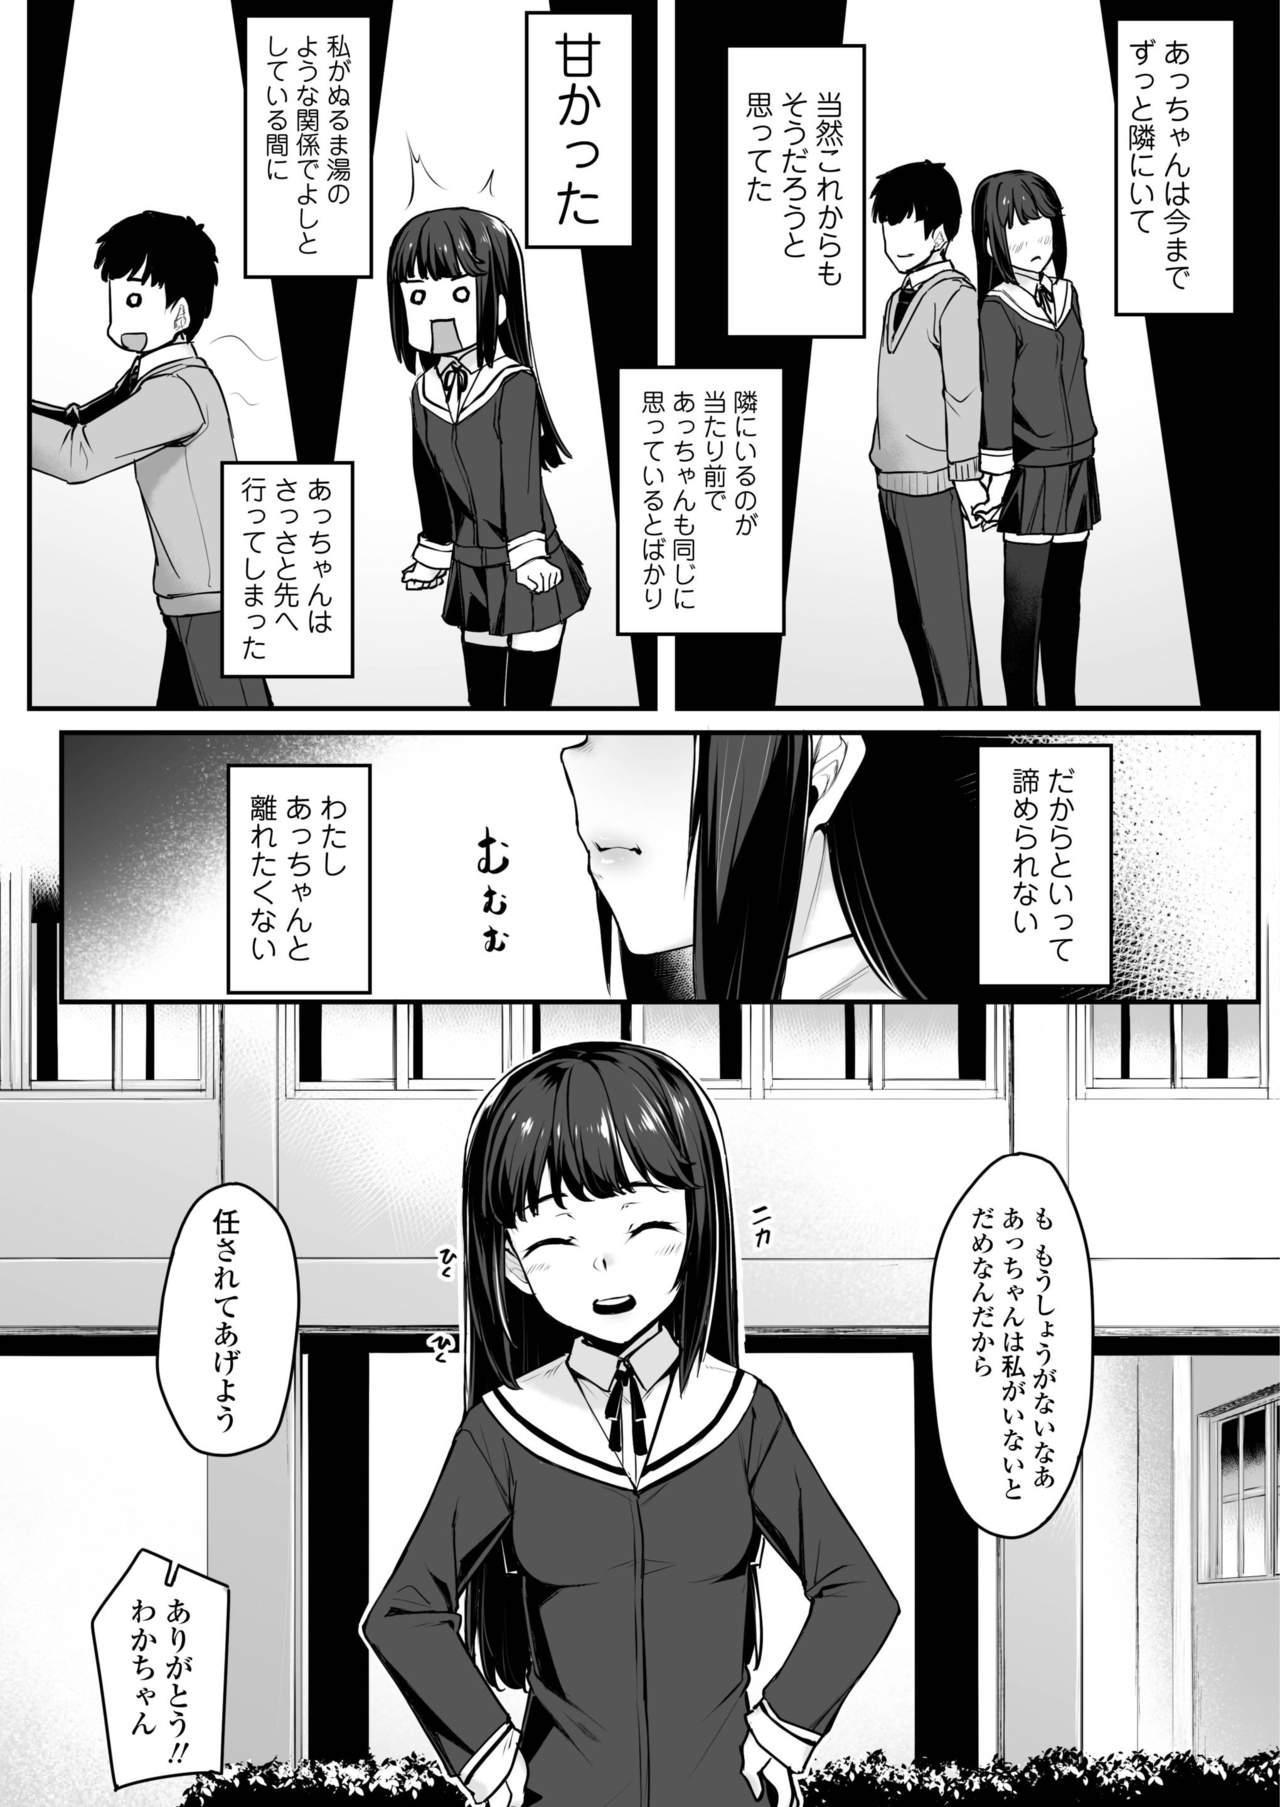 COMIC AOHA 2019 Haru 336